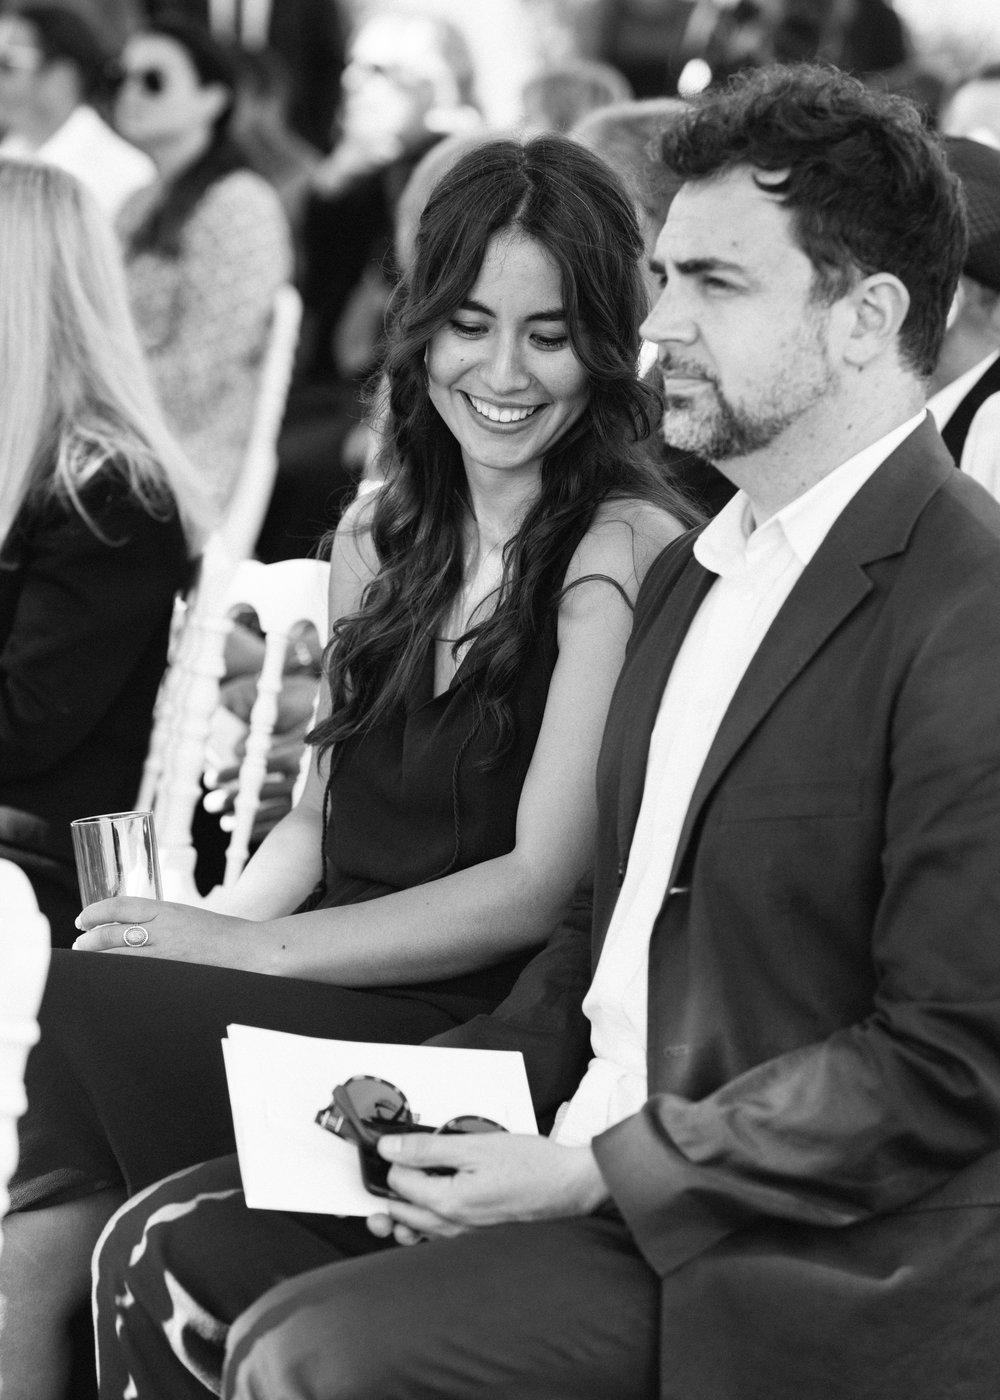 Nora&Chris_Ceremony026.jpg